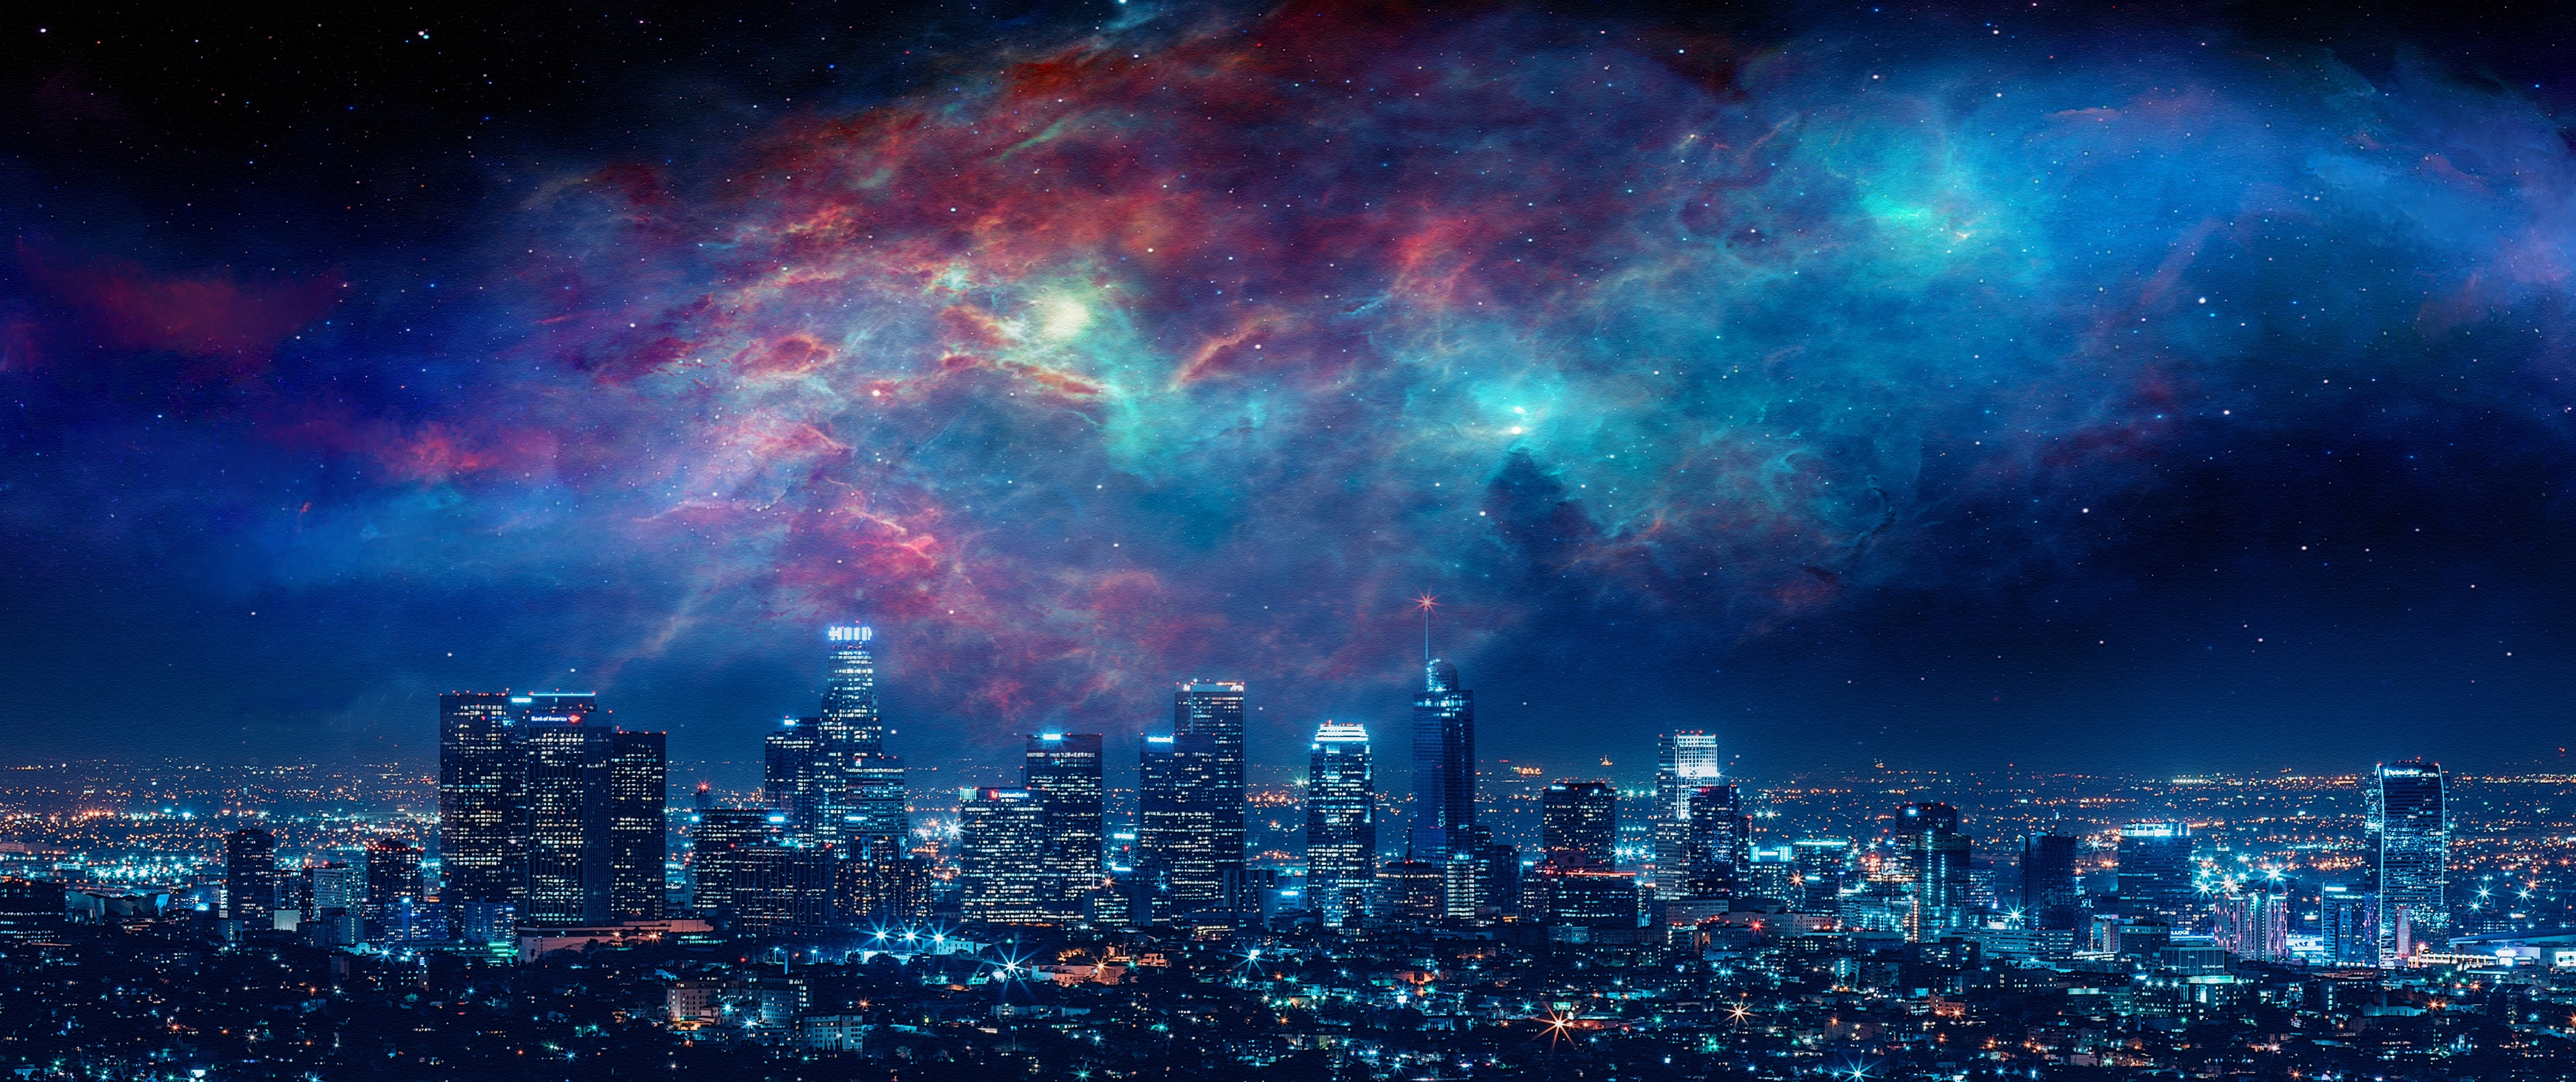 Los Angeles Night Sky Nebula 3765x1581